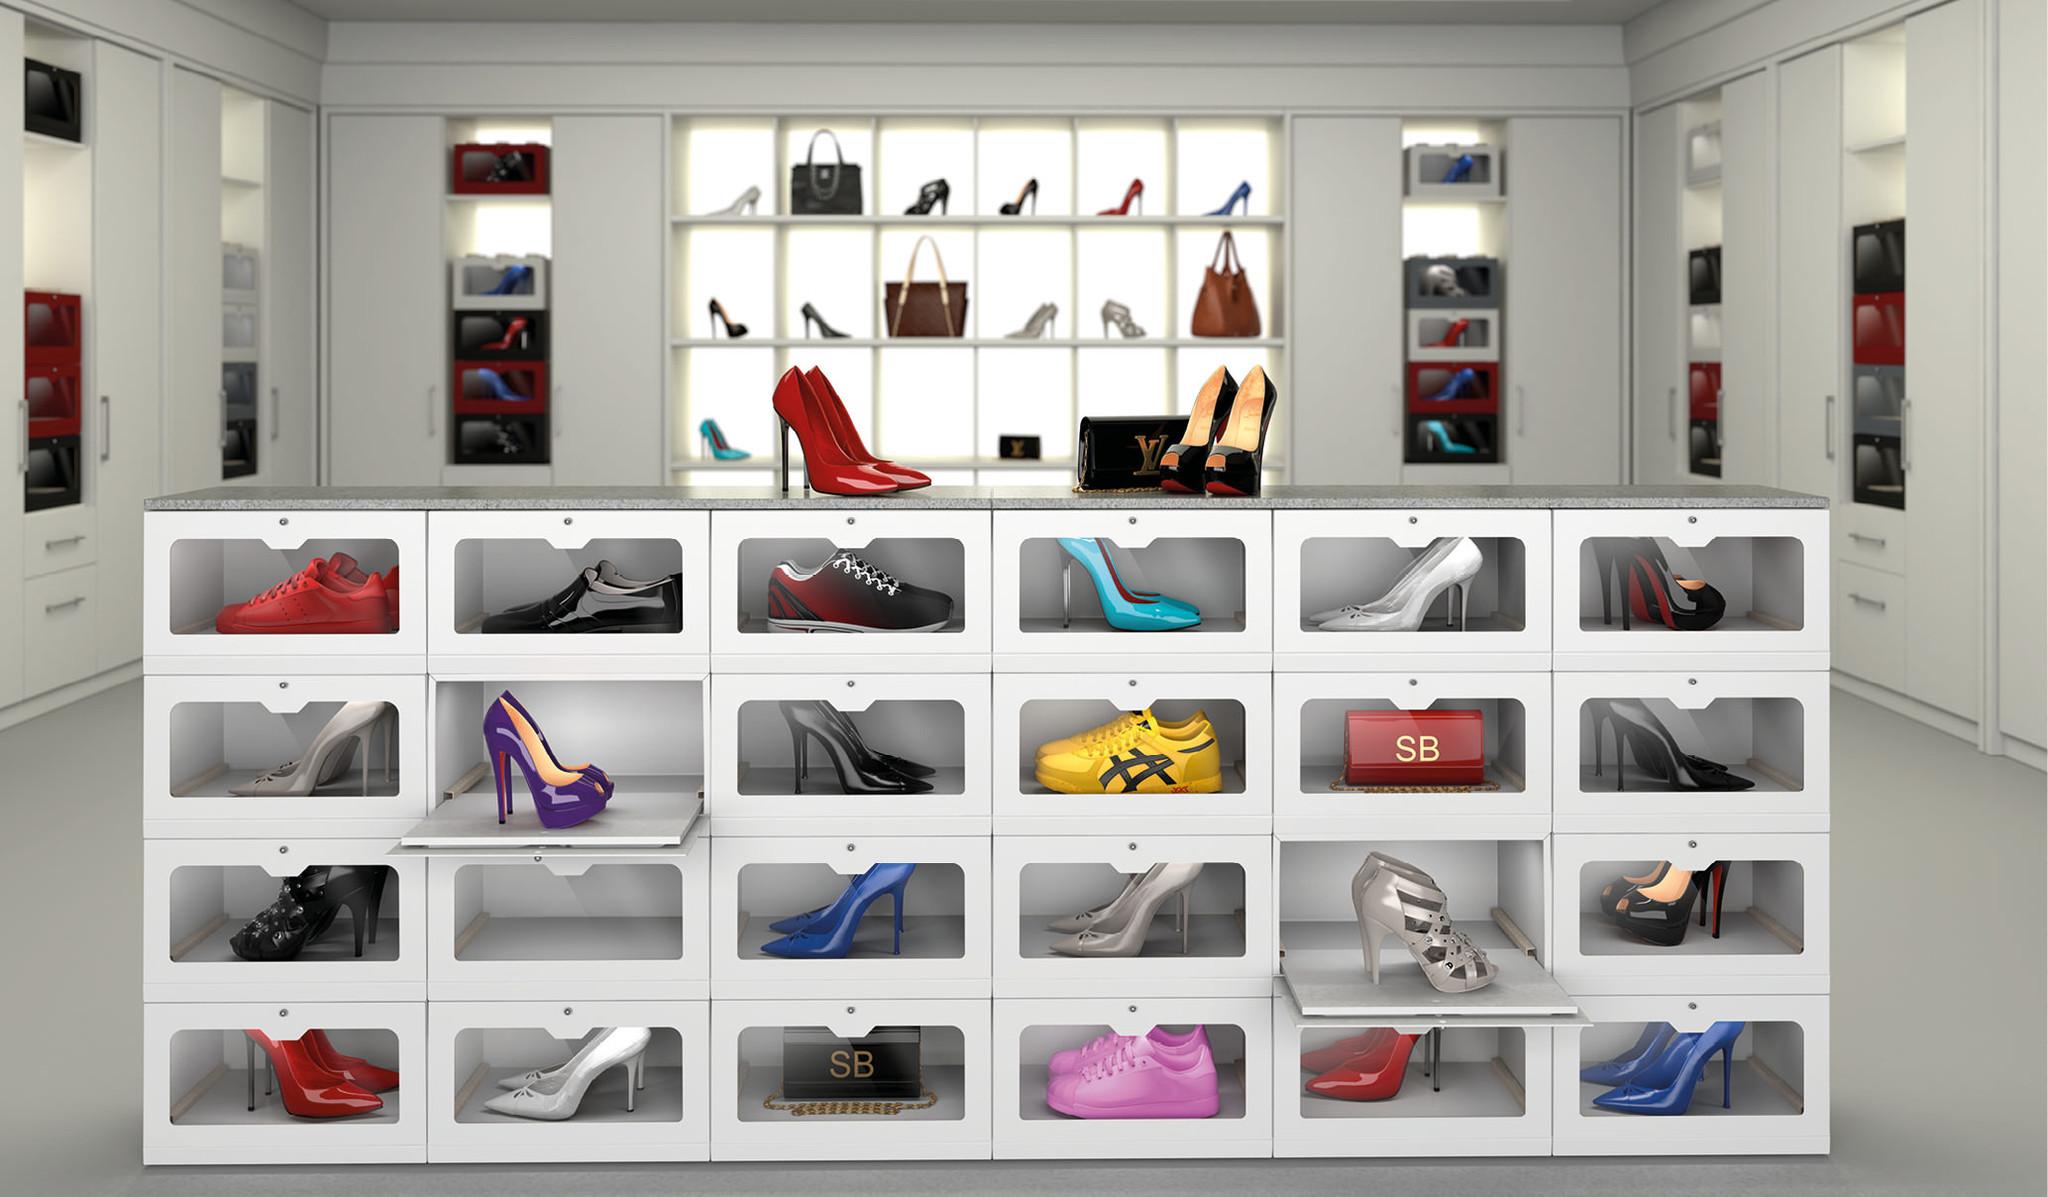 showbox sneaker aufbewahrung sneaker box nachhaltige aufbewahrung showbox more than. Black Bedroom Furniture Sets. Home Design Ideas